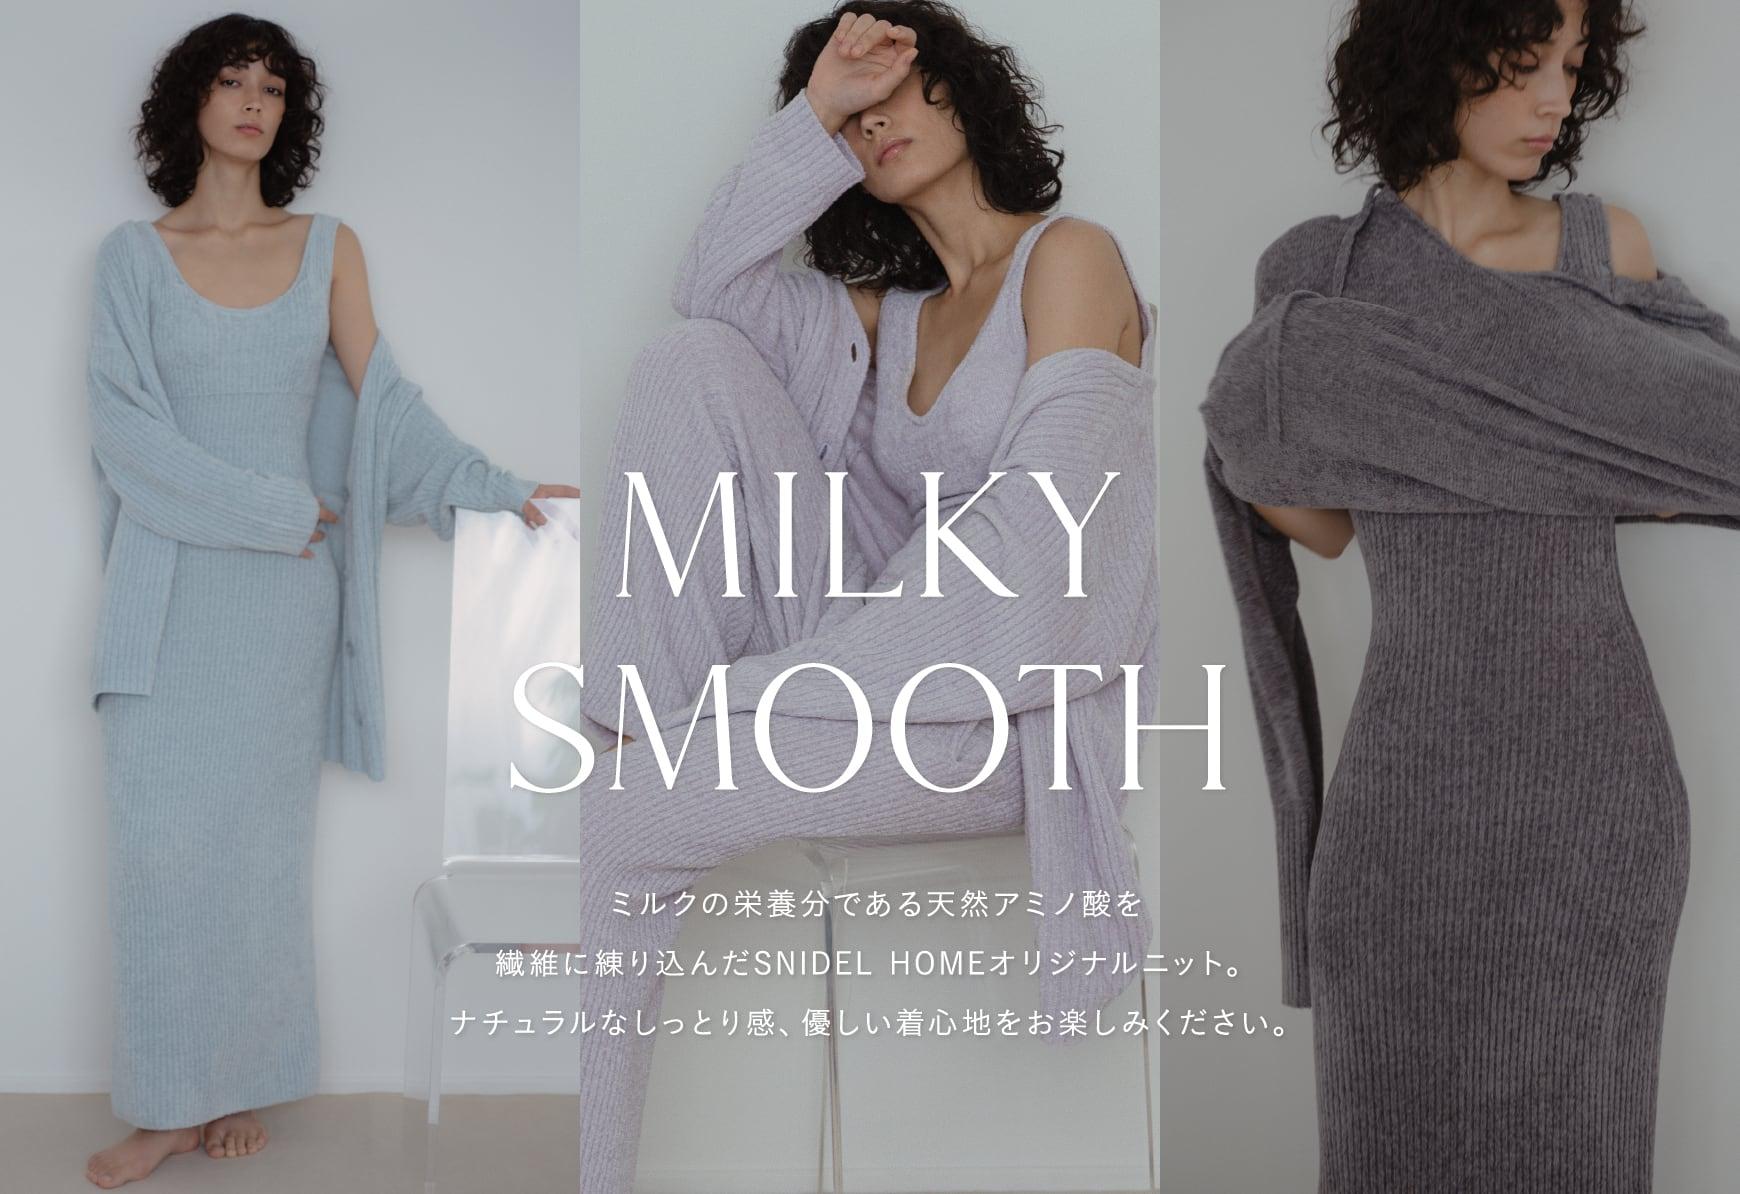 Milky Smooth ミルキースムース 天然アミノ酸を繊維に練り込んだSNIDEL HOMEオリジナルニット